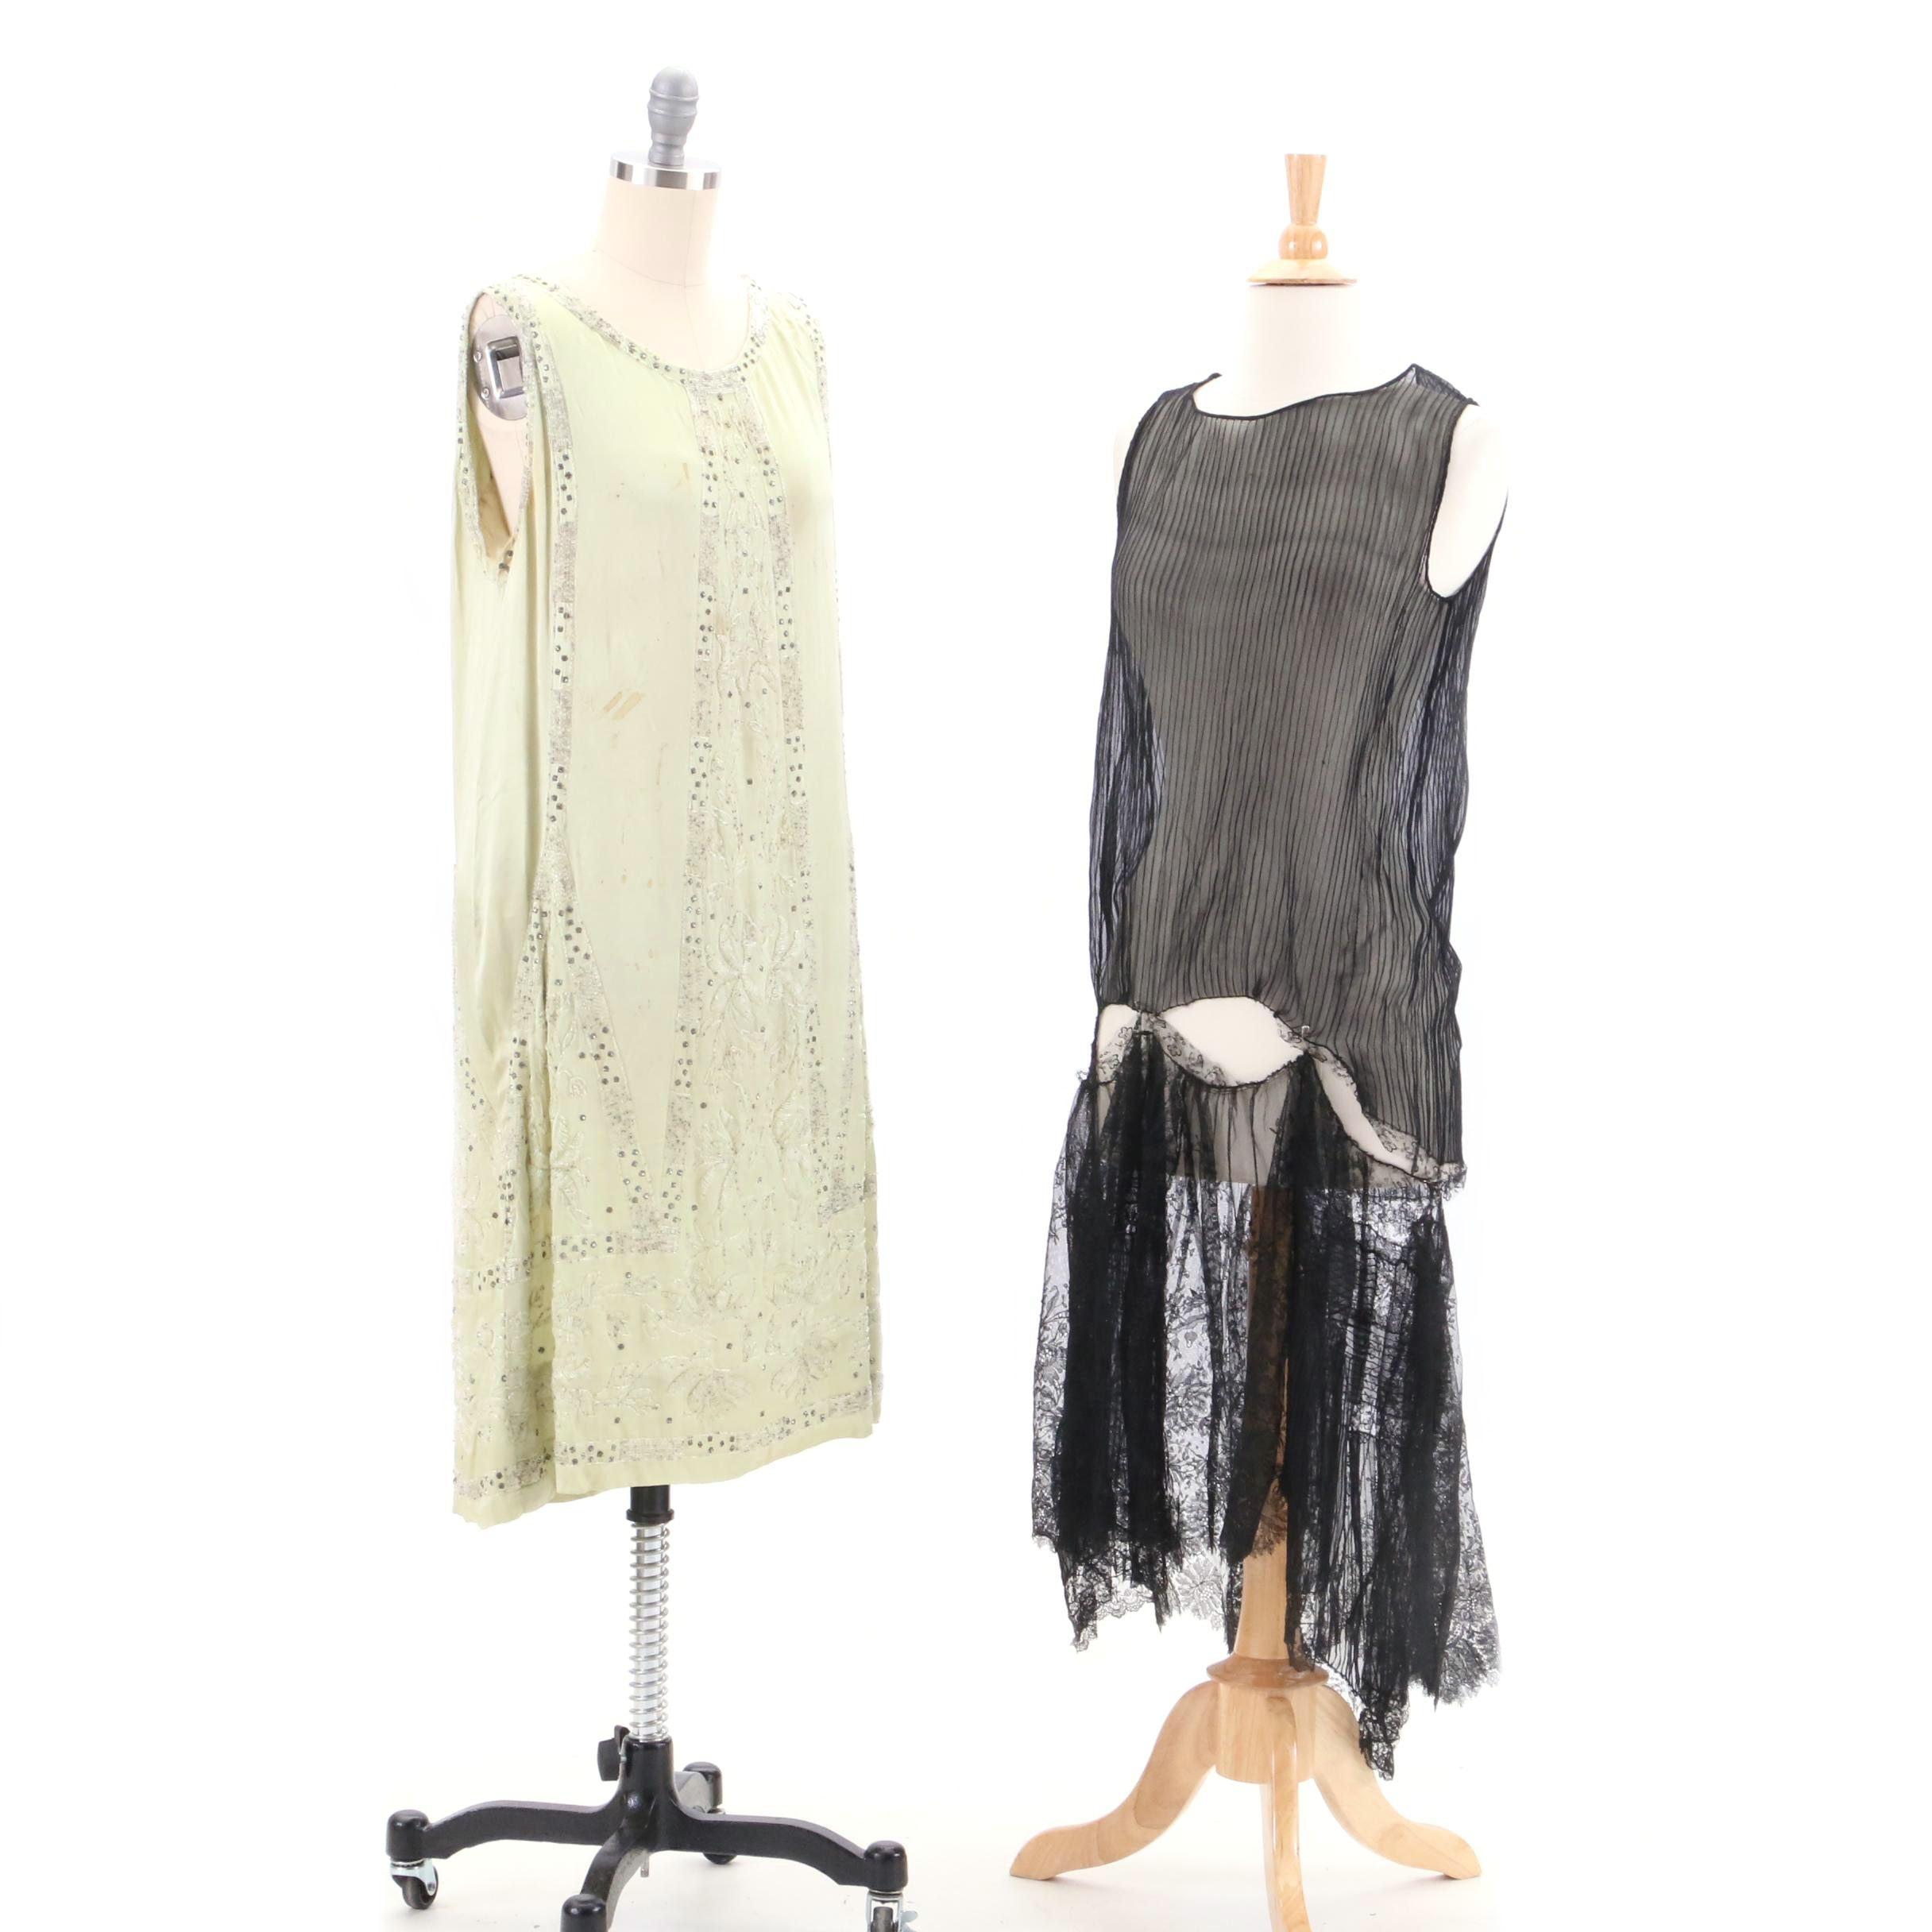 Circa 1920s Vintage Art Deco Silk Dresses